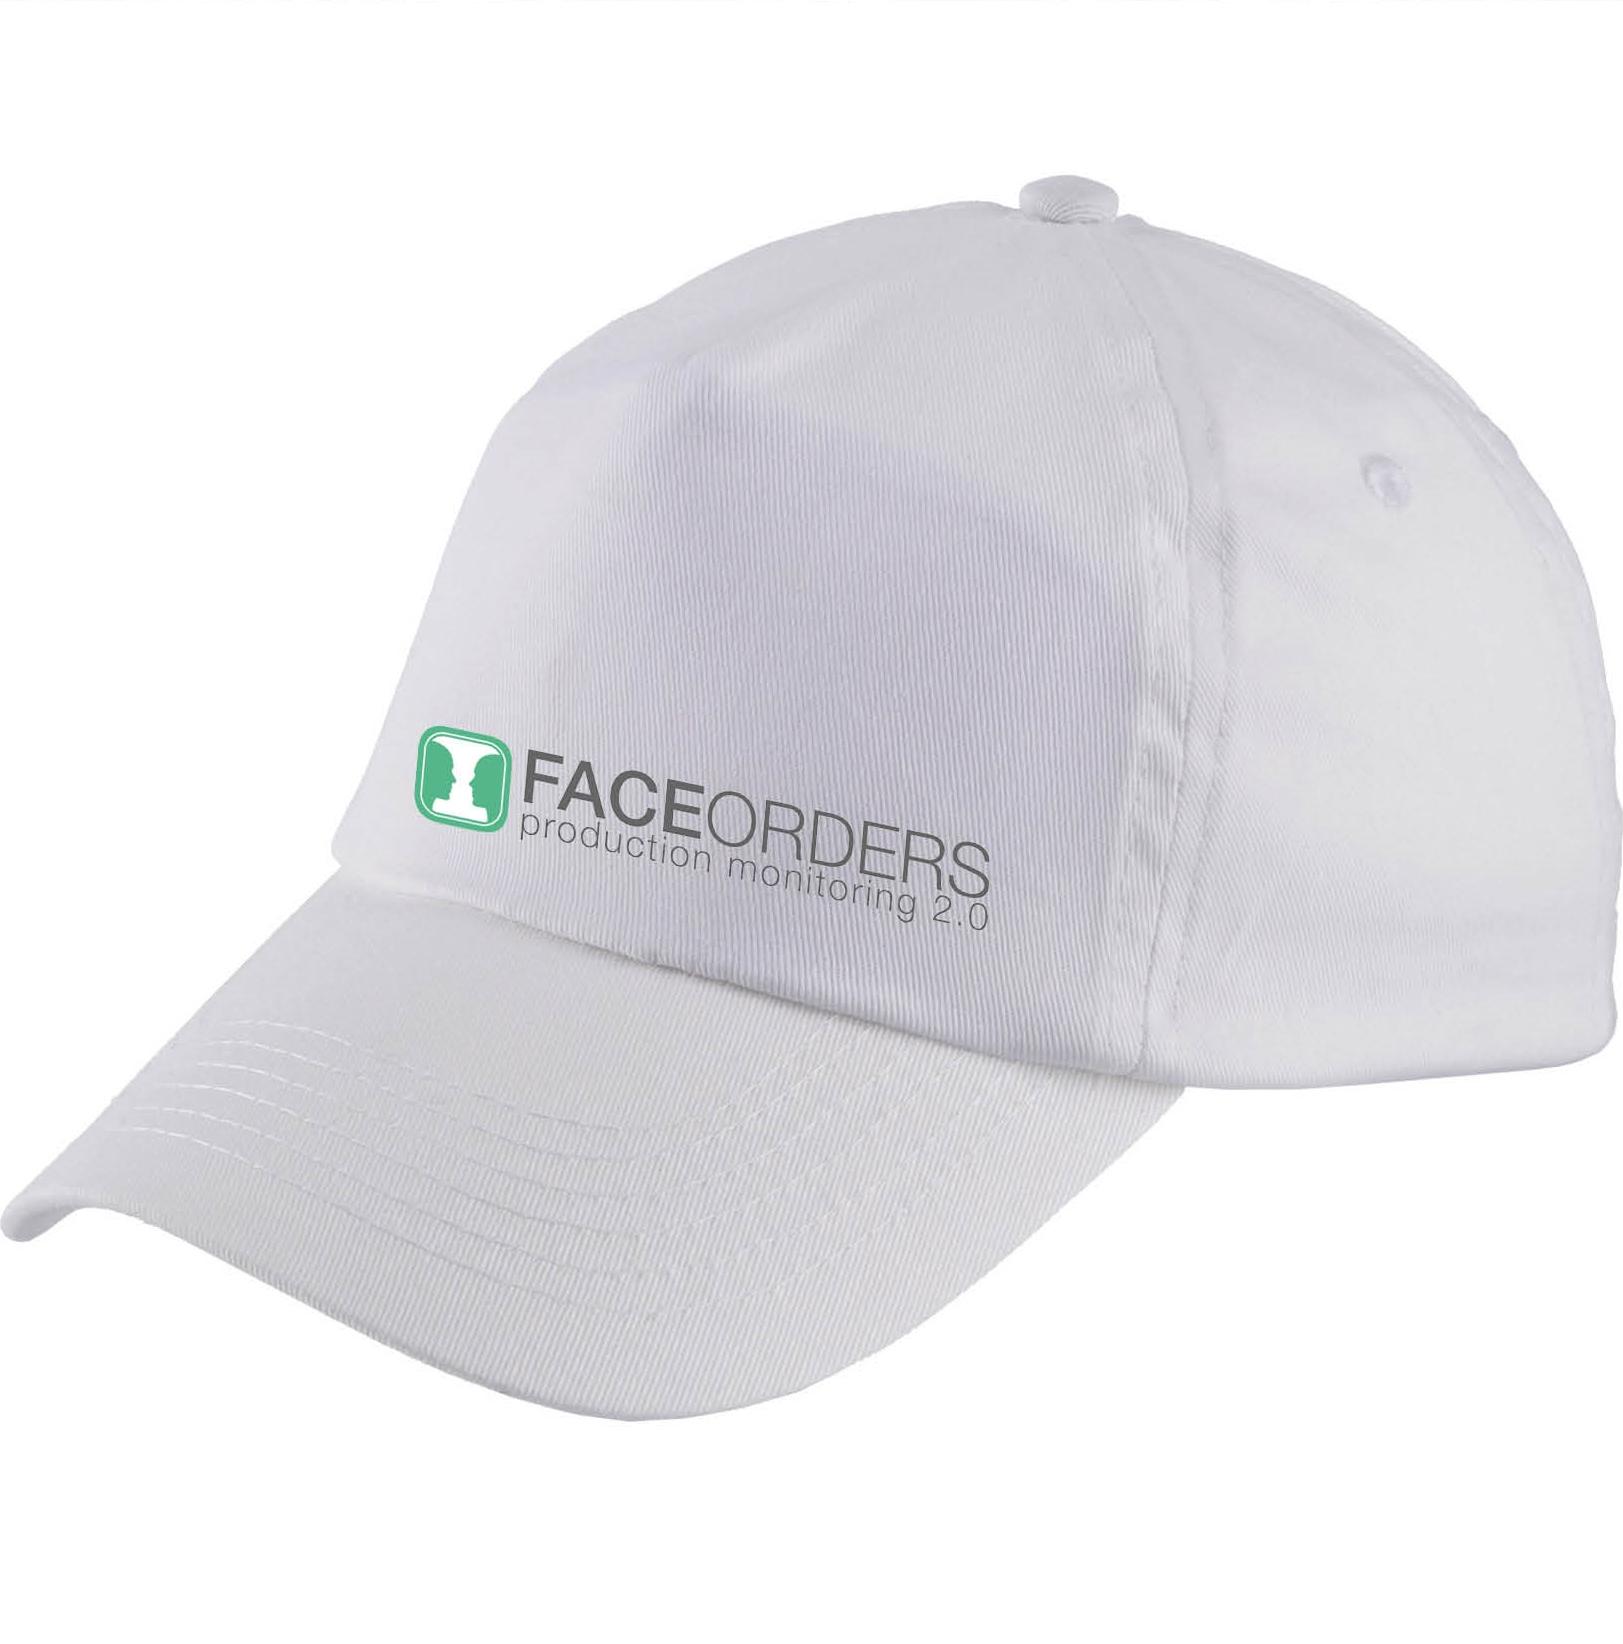 accessoires-FACE-ORDER2__1_-1499096113.jpg